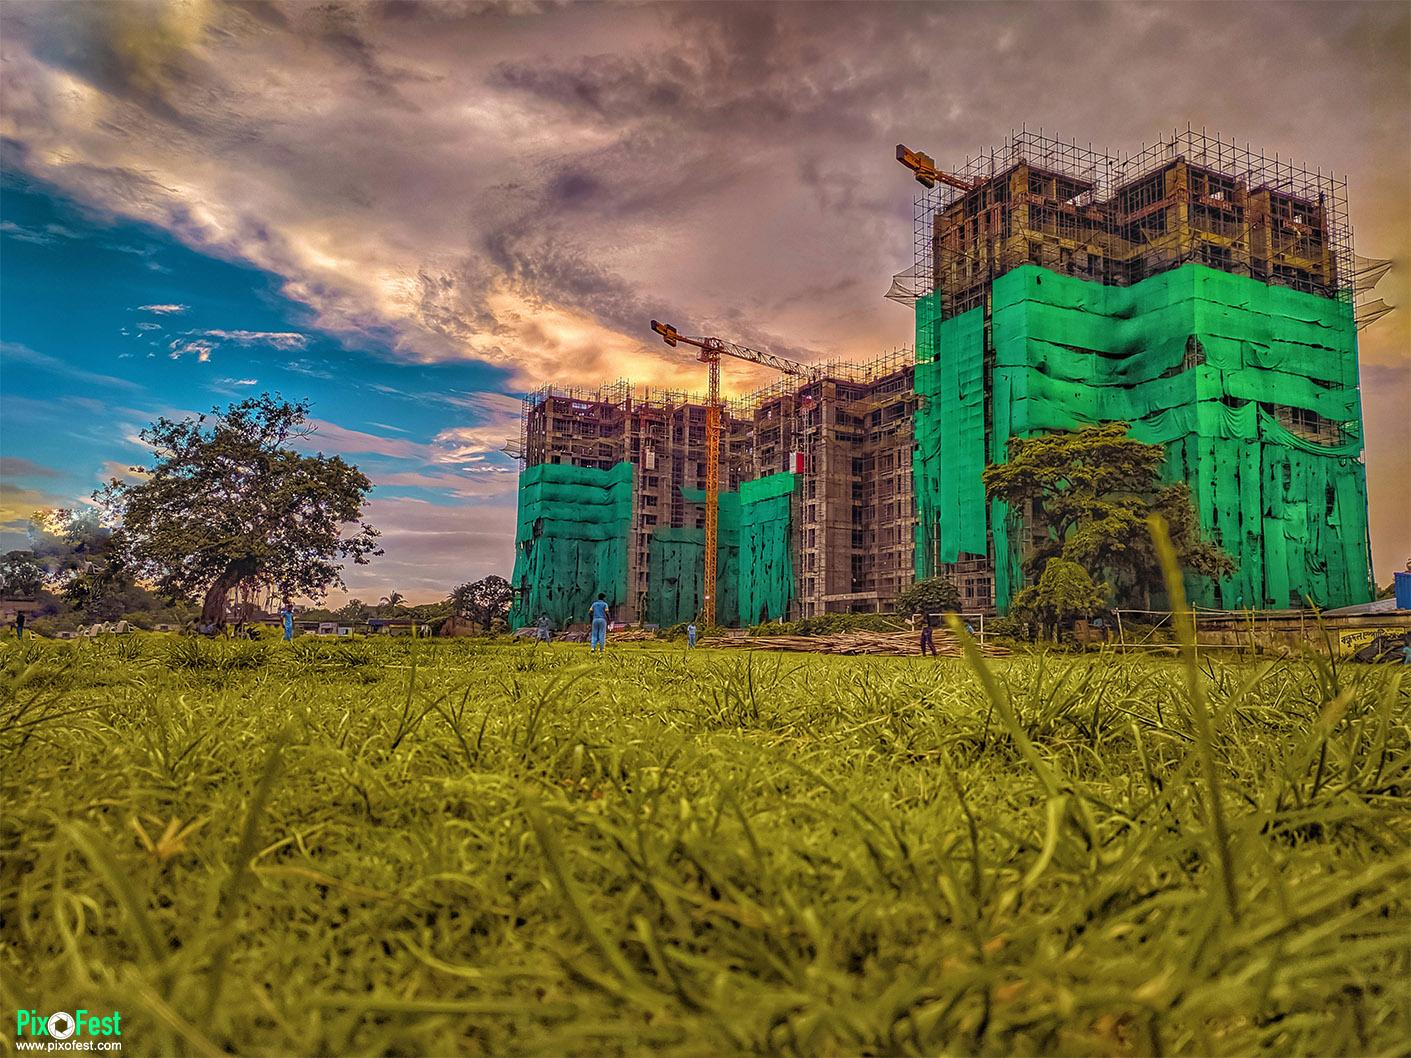 building,sky,landscapes,landscapes,grass,grassroots,colorfulsky,pixofest